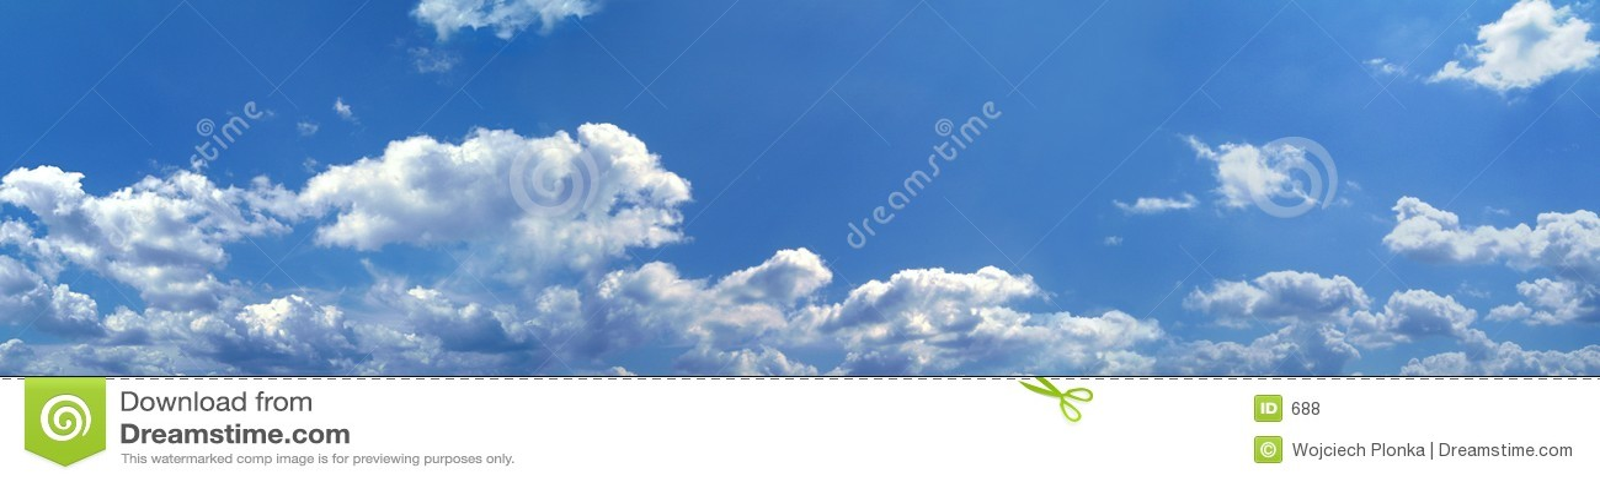 Niebieski panorama niebios